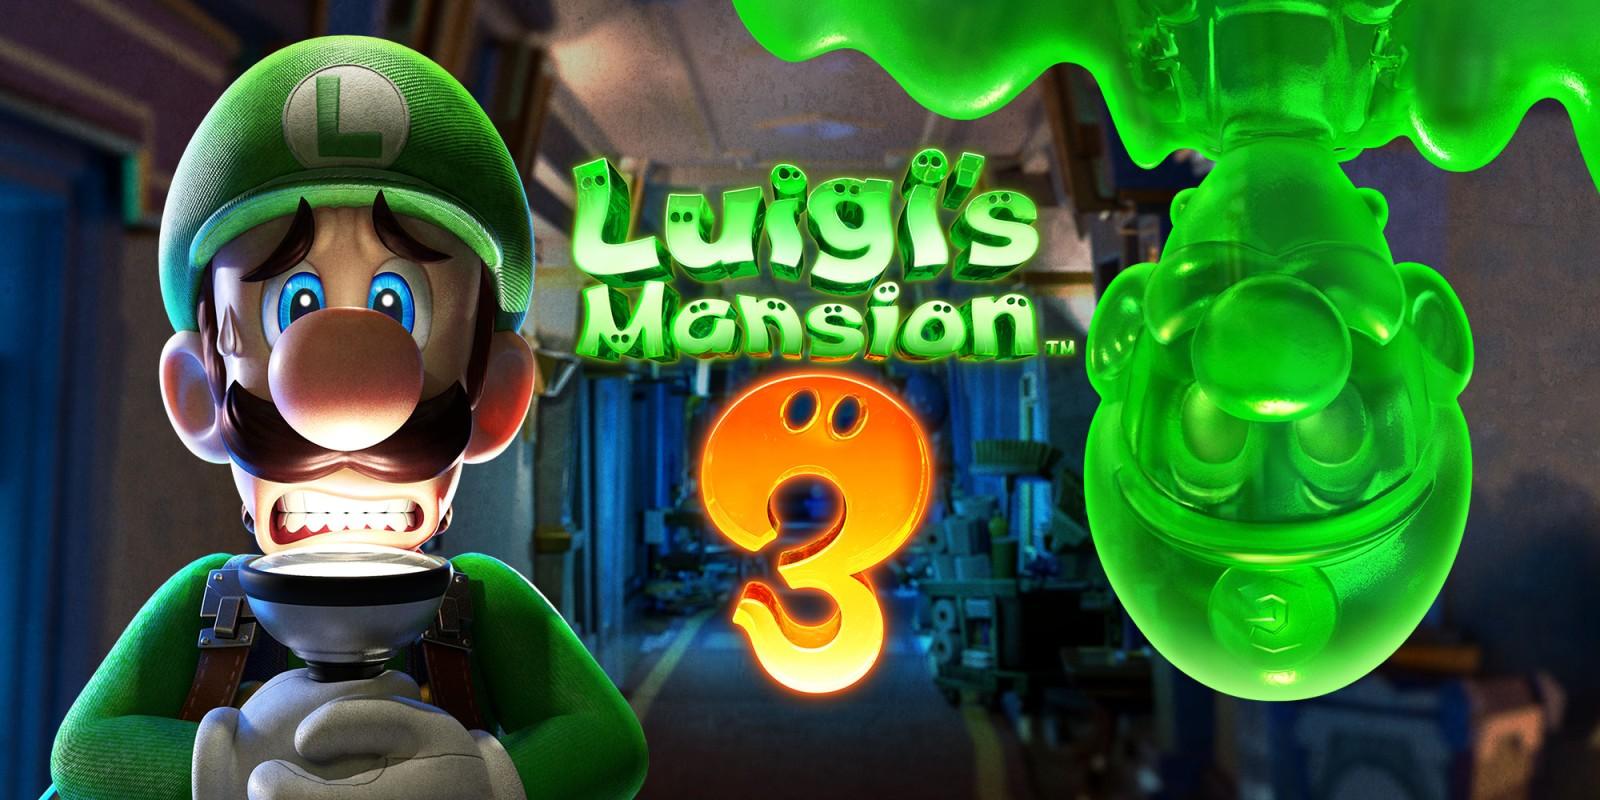 Adorable Luigi's Mansion 3 Moment